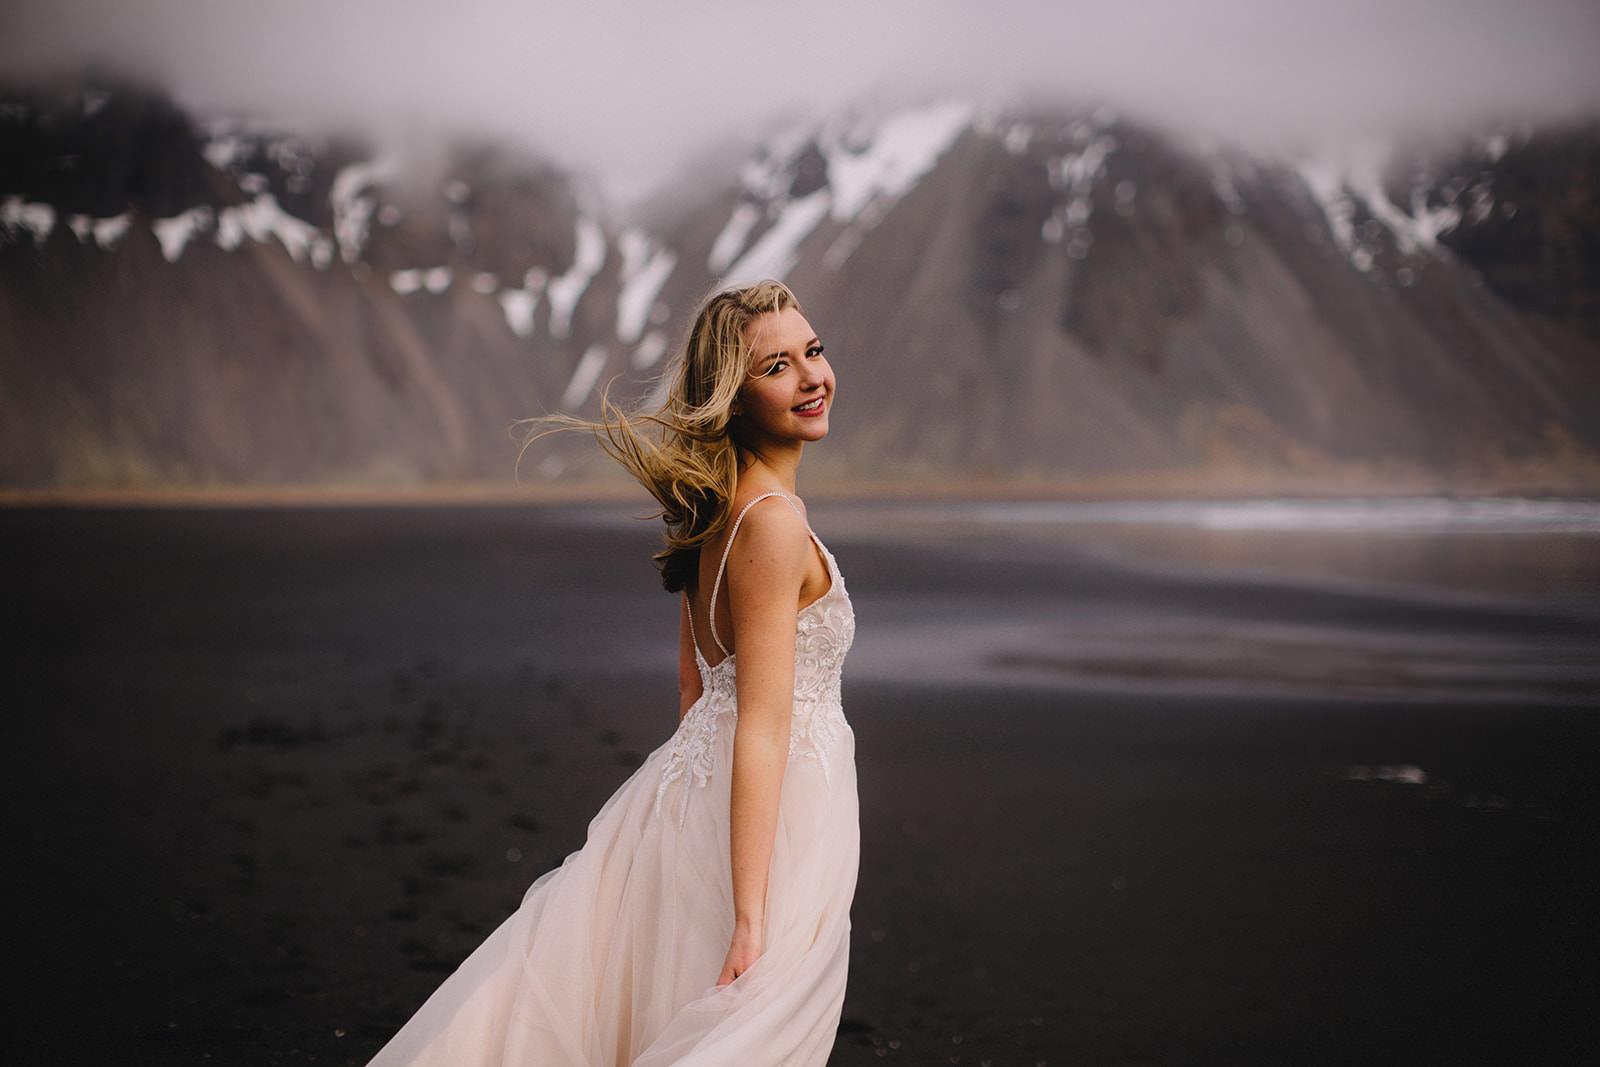 Icelandic Iceland Elopement Wedding Elope Photographer Eloping Reykjavík Vik Black Sand Beach Jökulsárlón Skogafoss Waterfall Vestrahorn Mountain Liz Osban Photography Destination 44.jpg